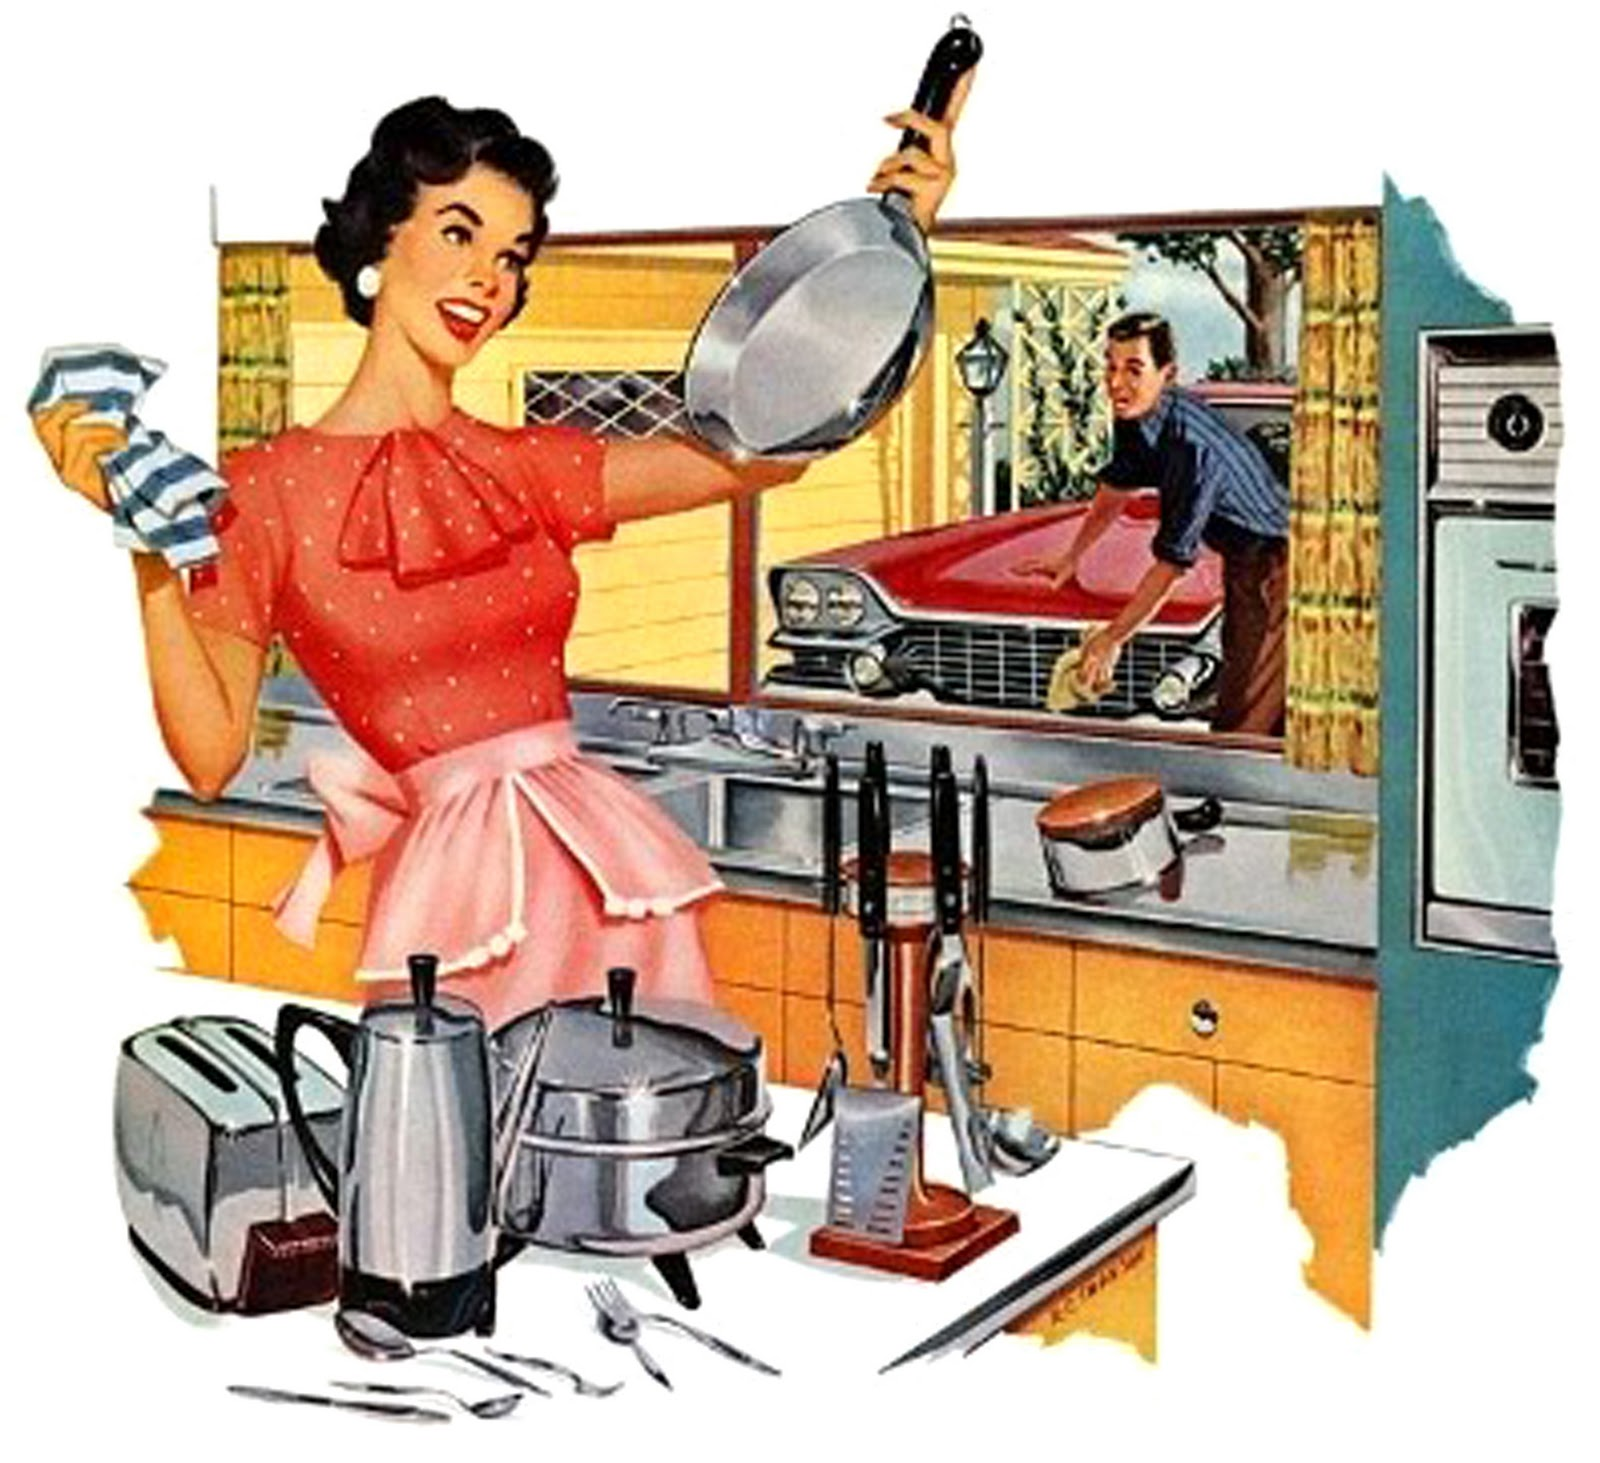 Как навести порядок в доме и жизни?